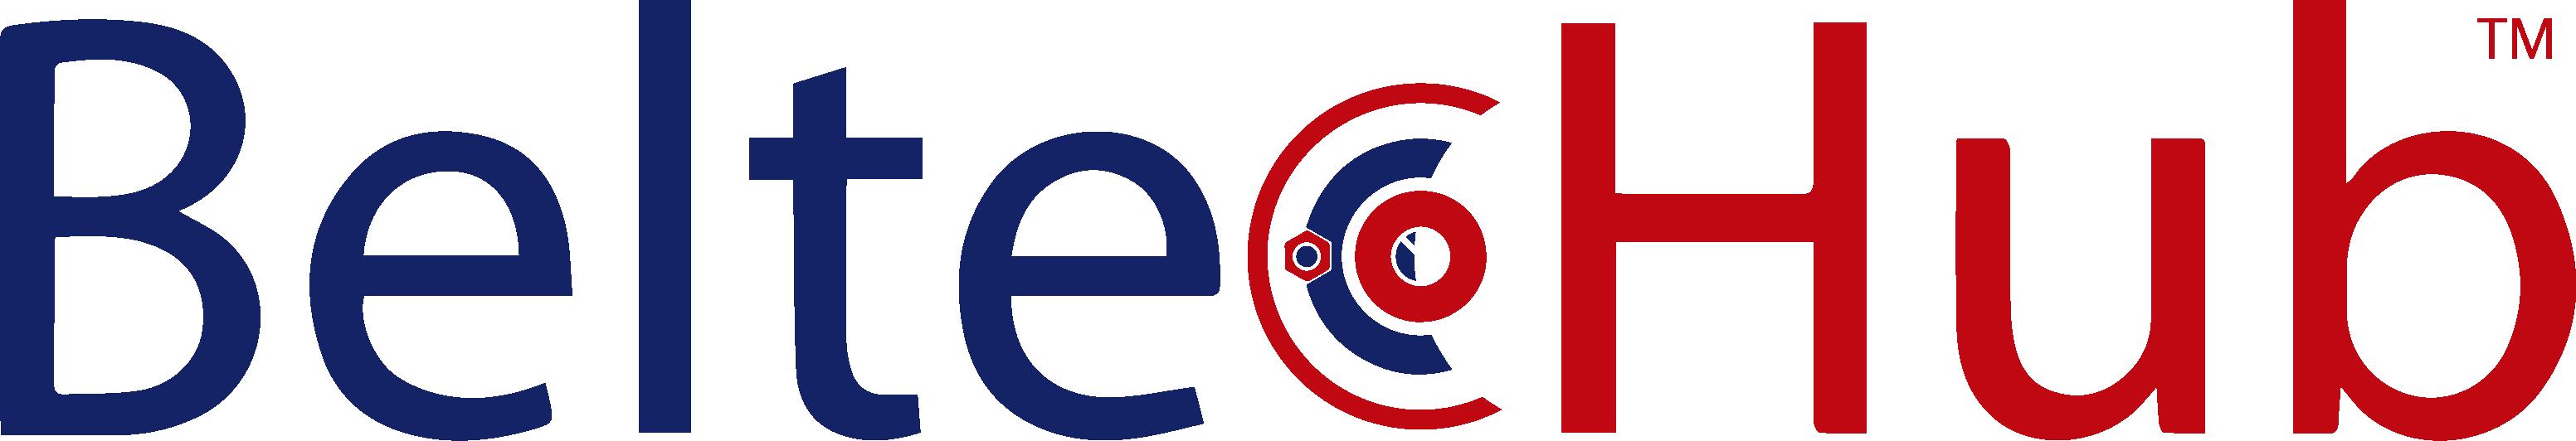 BETA   BeltecHub   Global Site